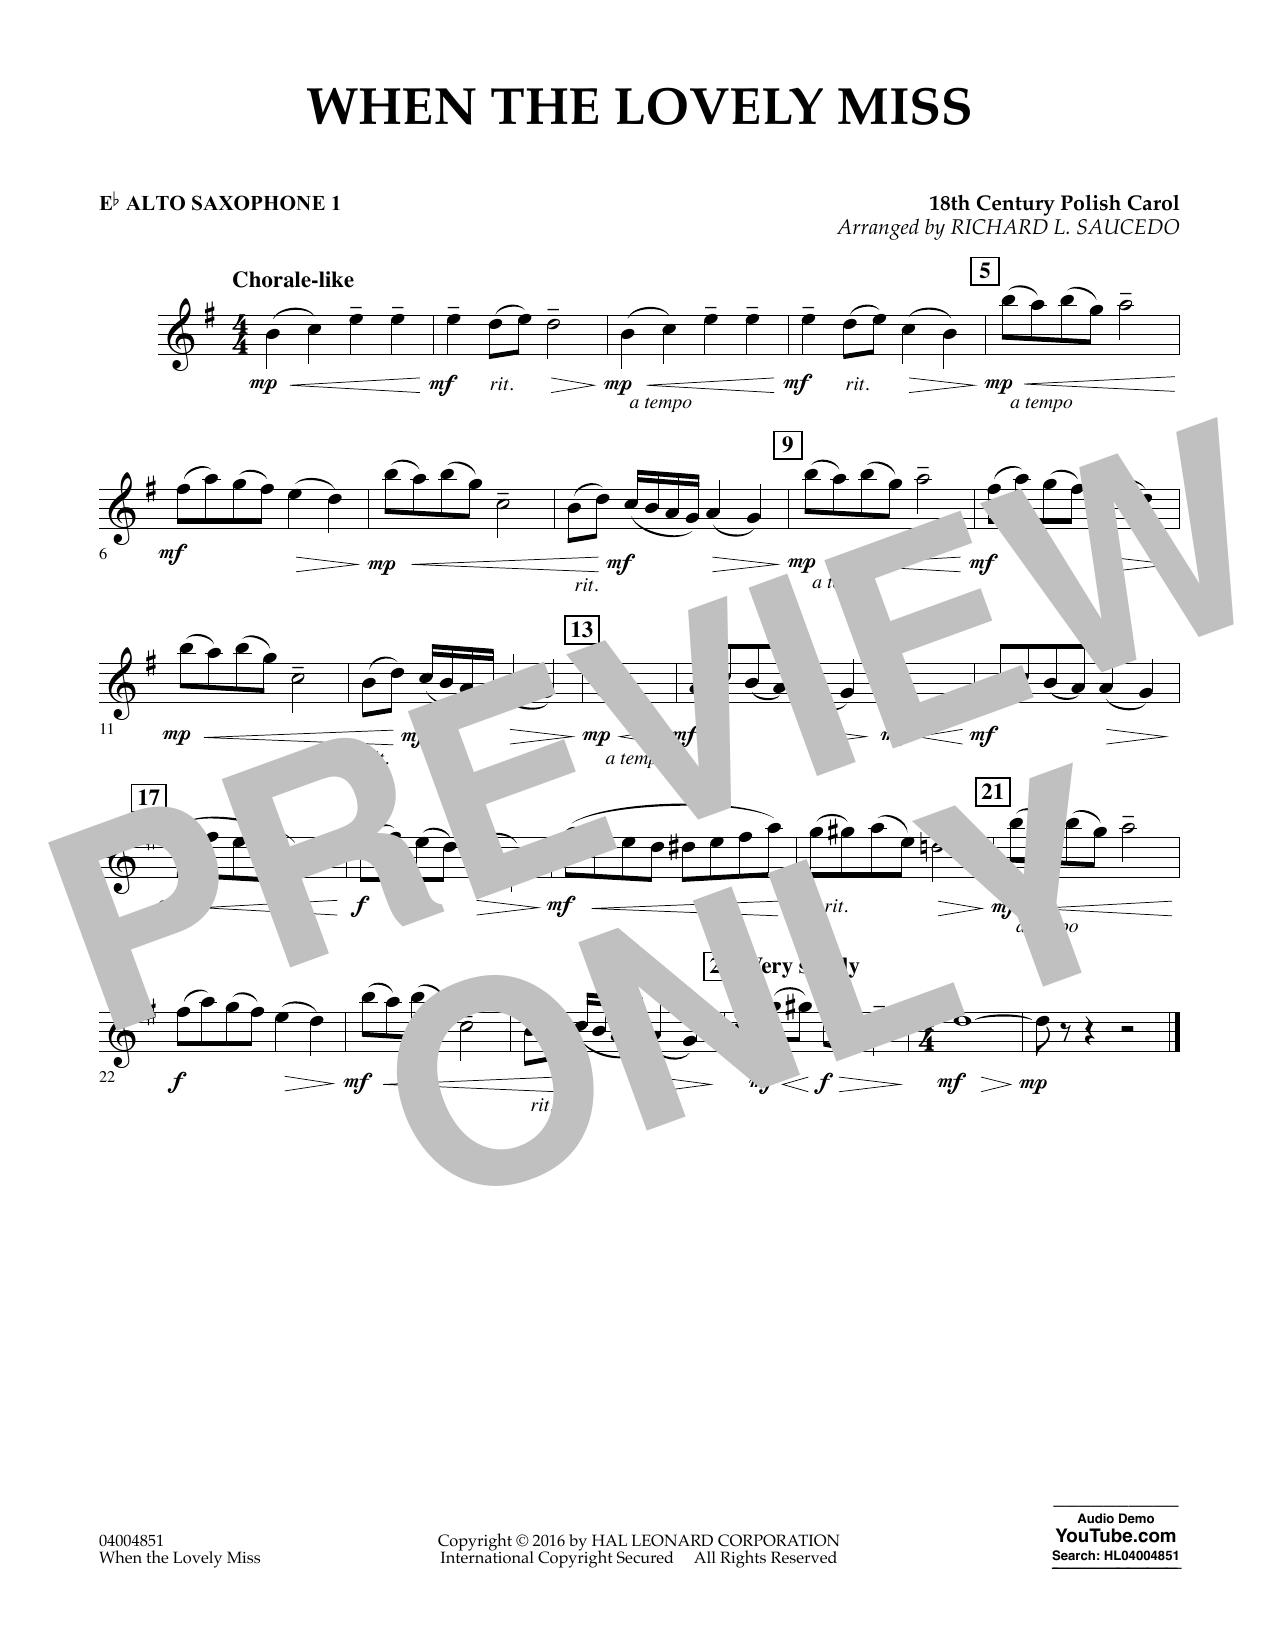 When the Lovely Miss (18th Century Polish Carol) - Eb Alto Saxophone 1 (Concert Band)